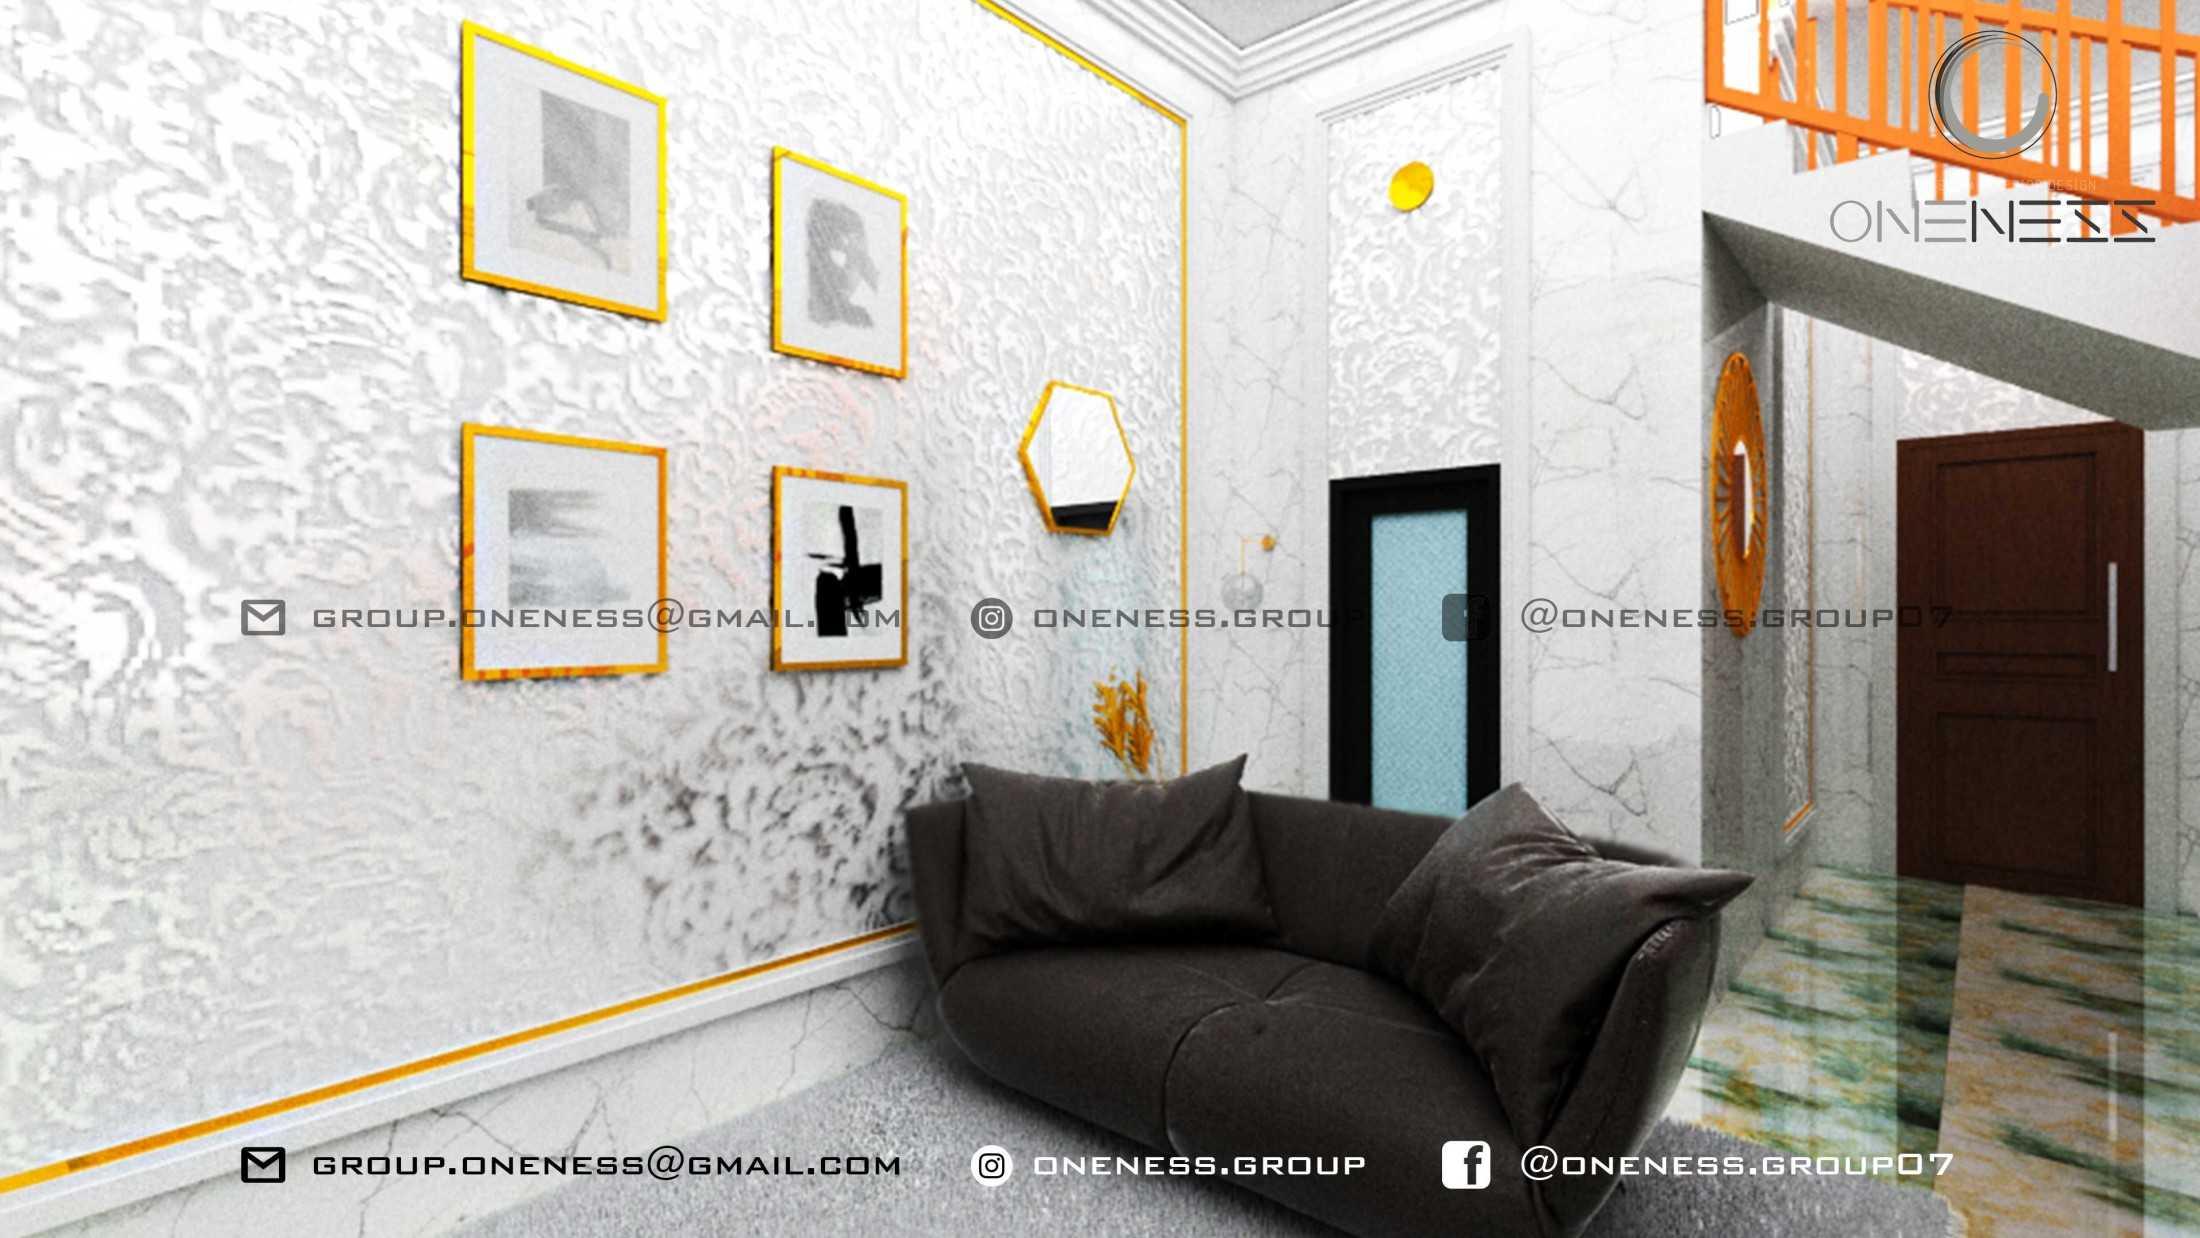 Oneness Group White Gold Classic Interior For Miss A Cirebon, Kota Cirebon, Jawa Barat, Indonesia Cirebon, Kota Cirebon, Jawa Barat, Indonesia Koridor  98637